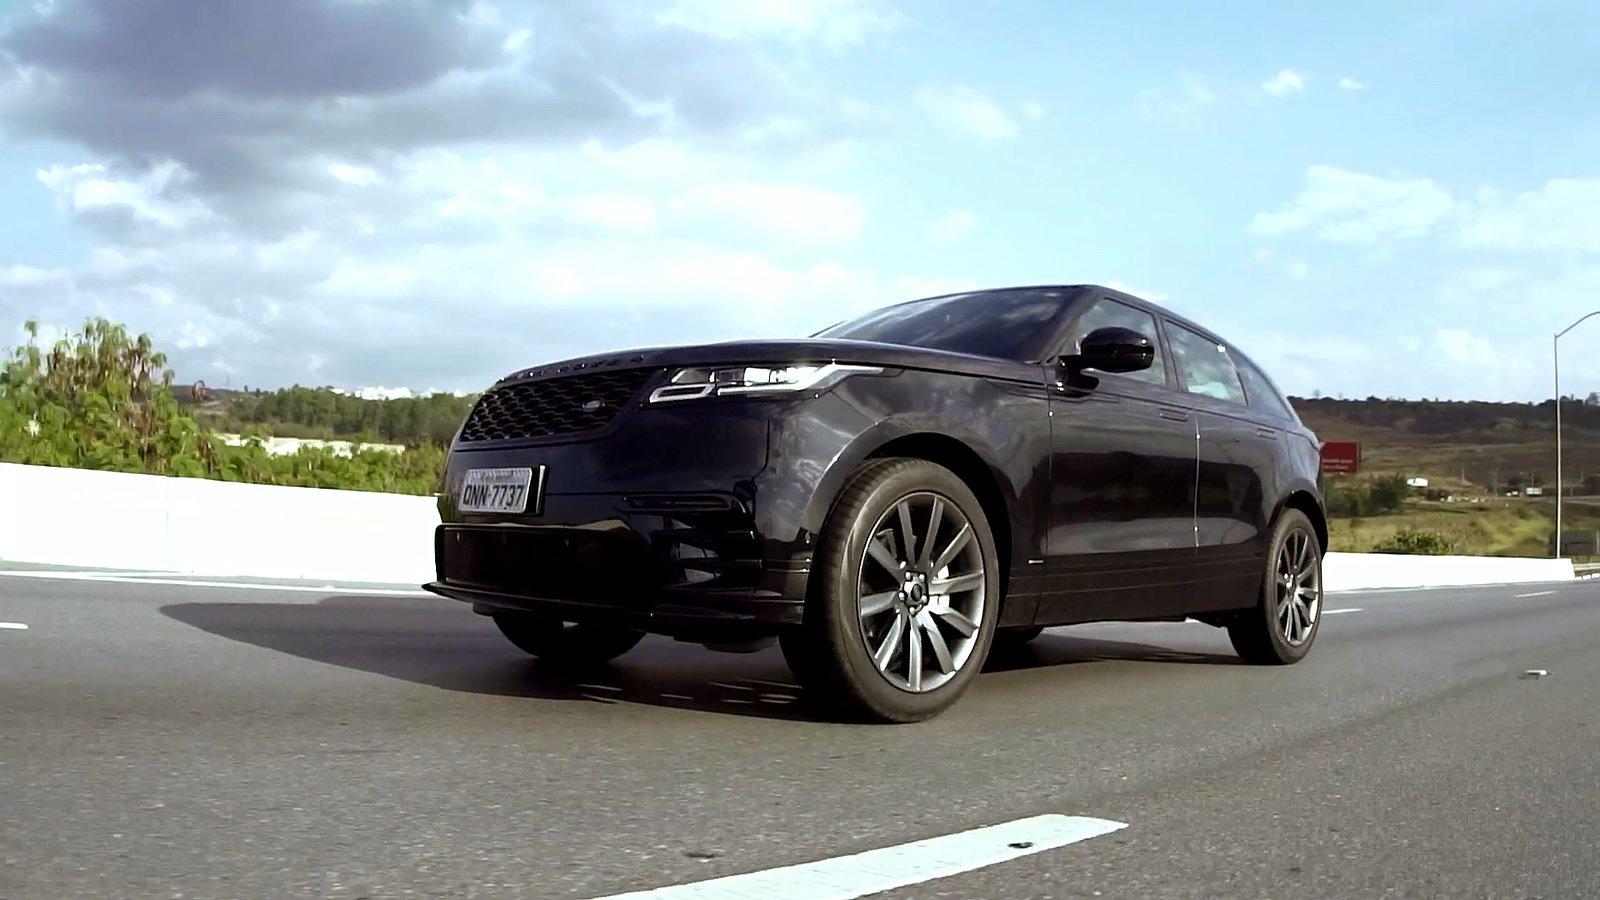 Range Rover Velar HSE custa R$ 445 mil